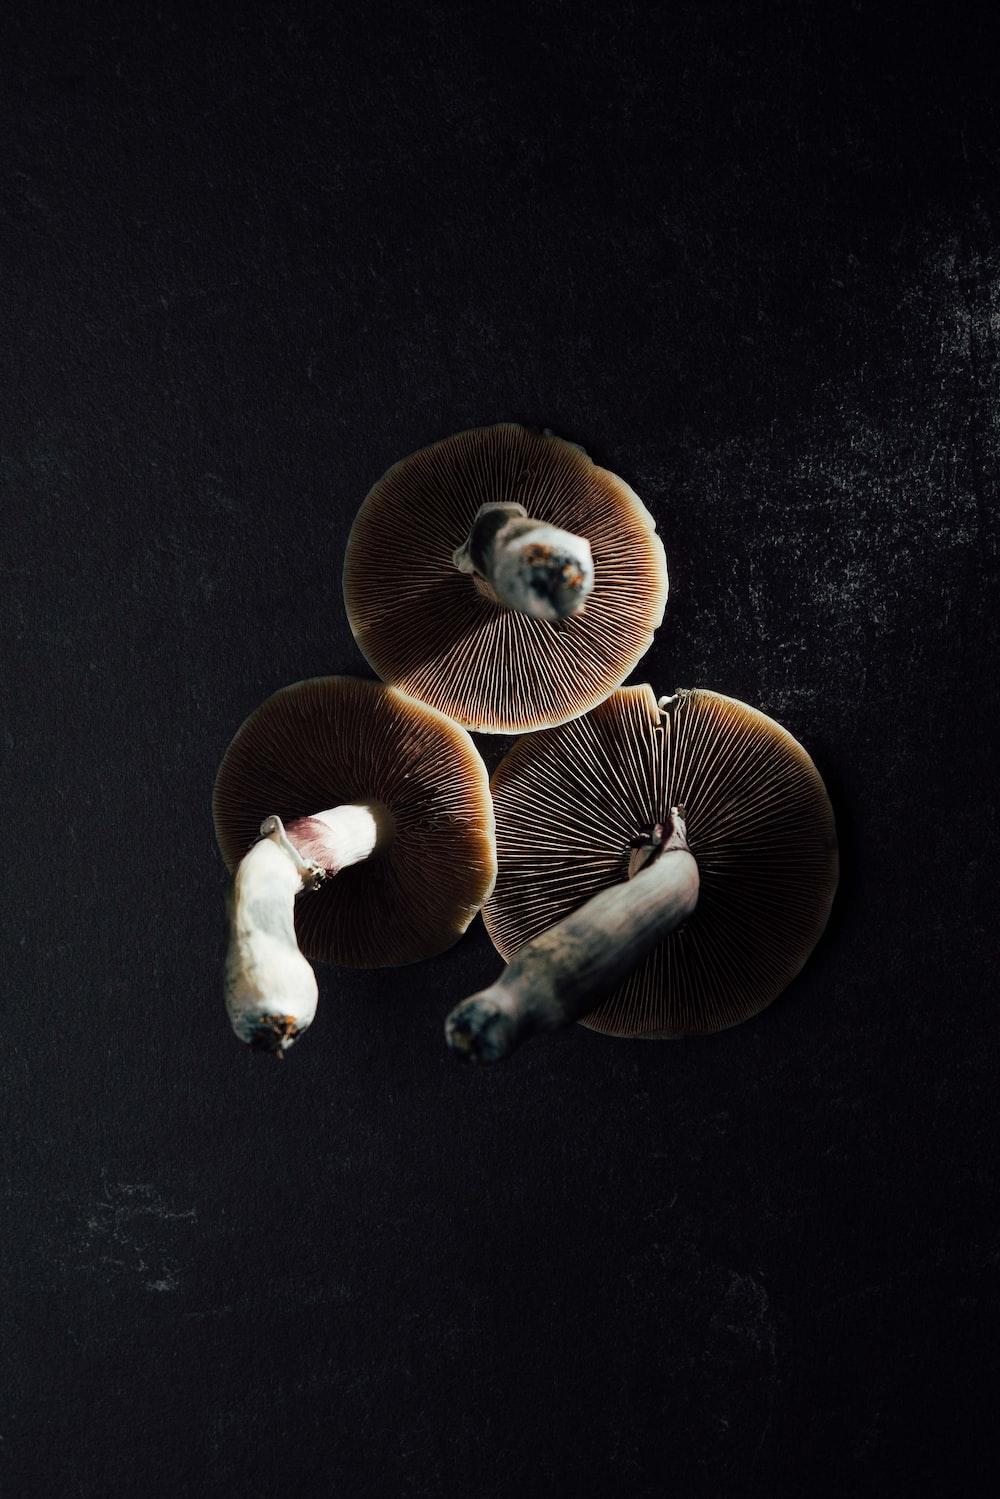 2 brown mushrooms on black textile